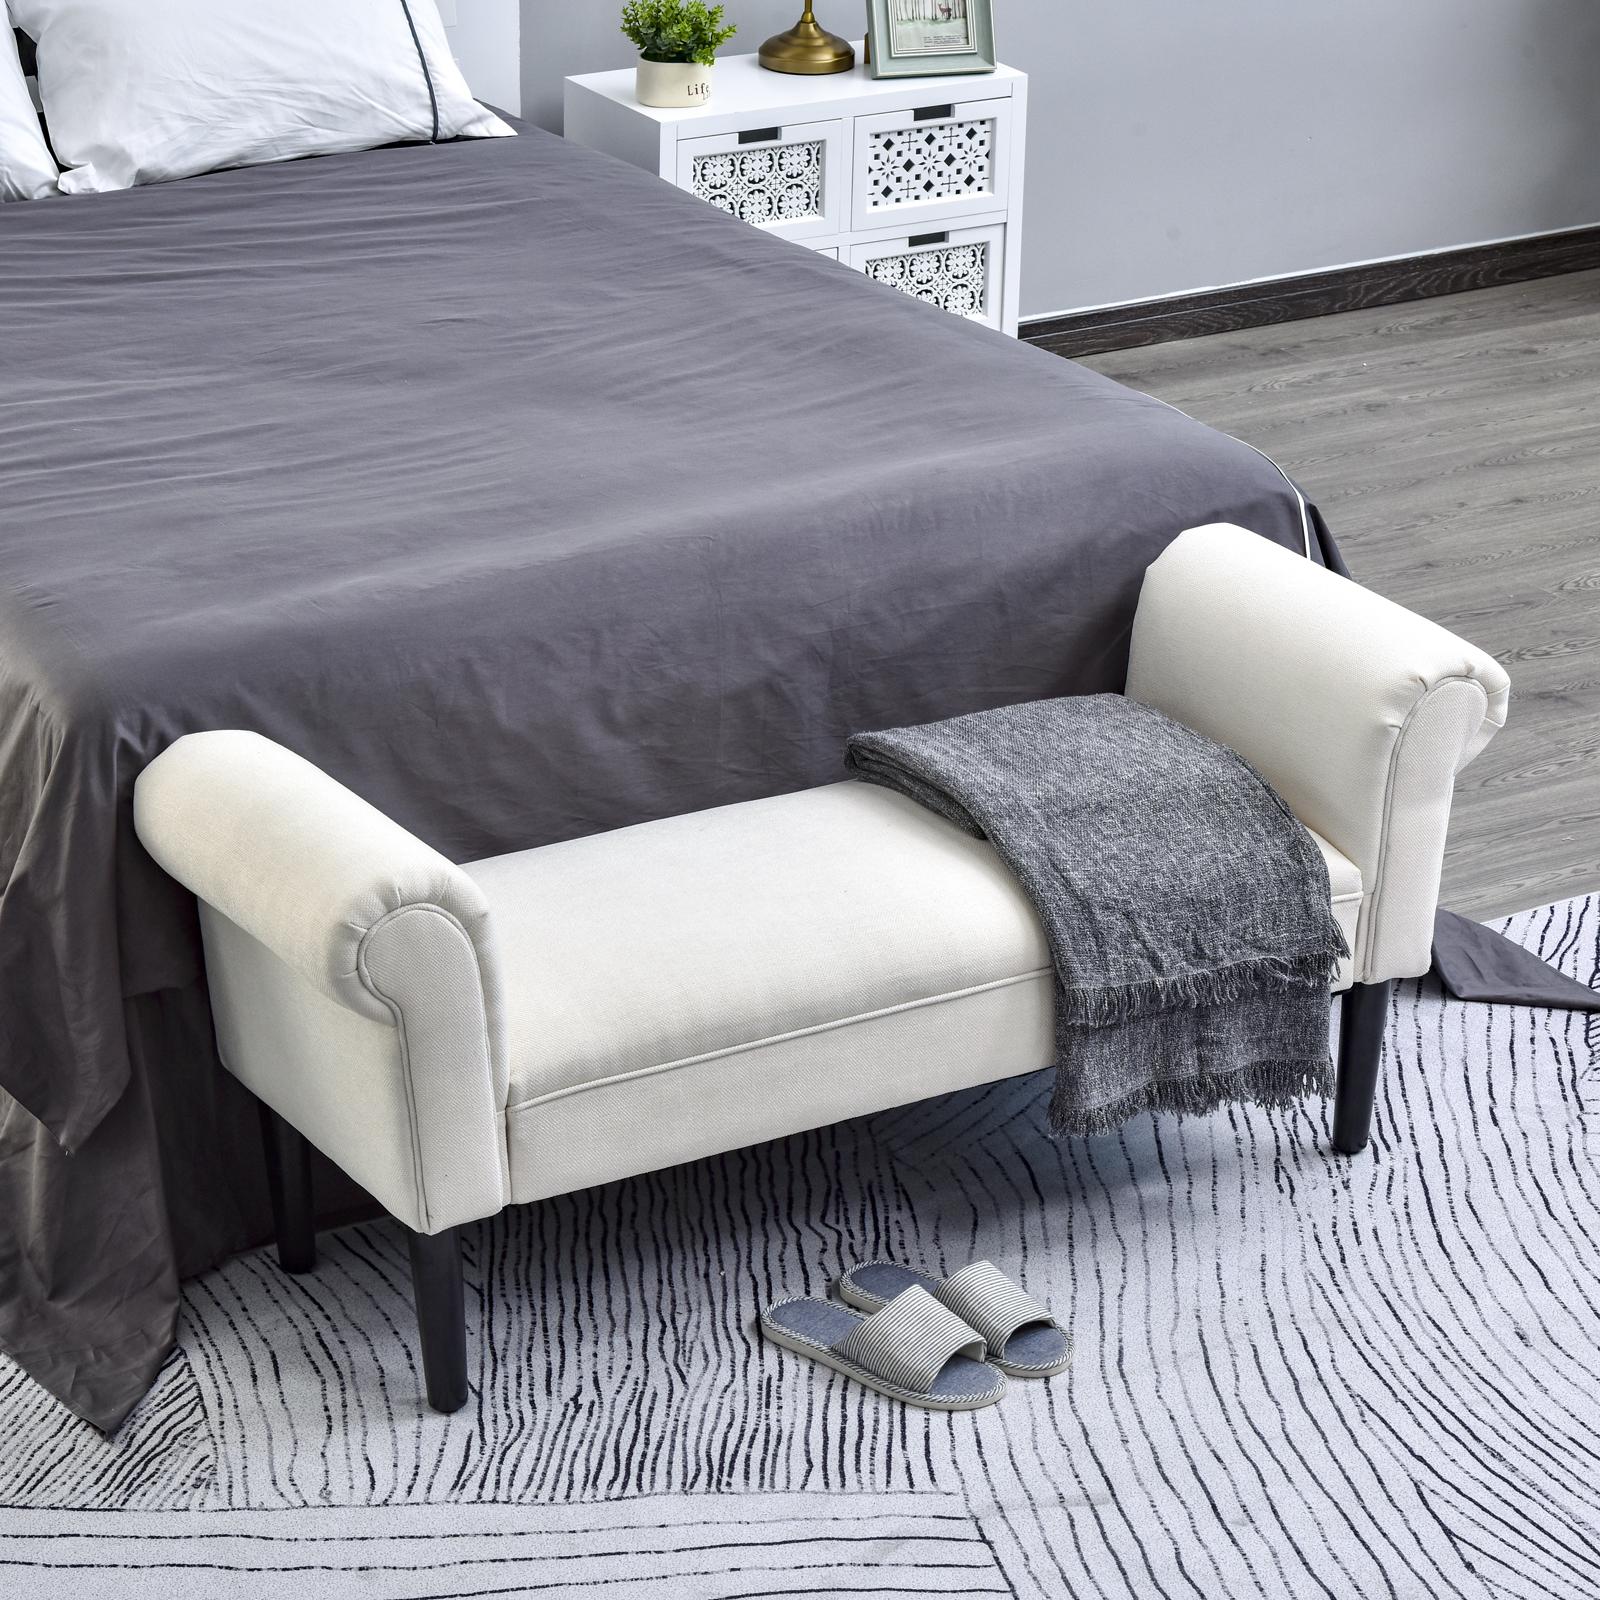 Homcom Deluxe 52 Linen Bed End Arm Bench Bedside Bench Footstool Home Decor 656114643338 Ebay